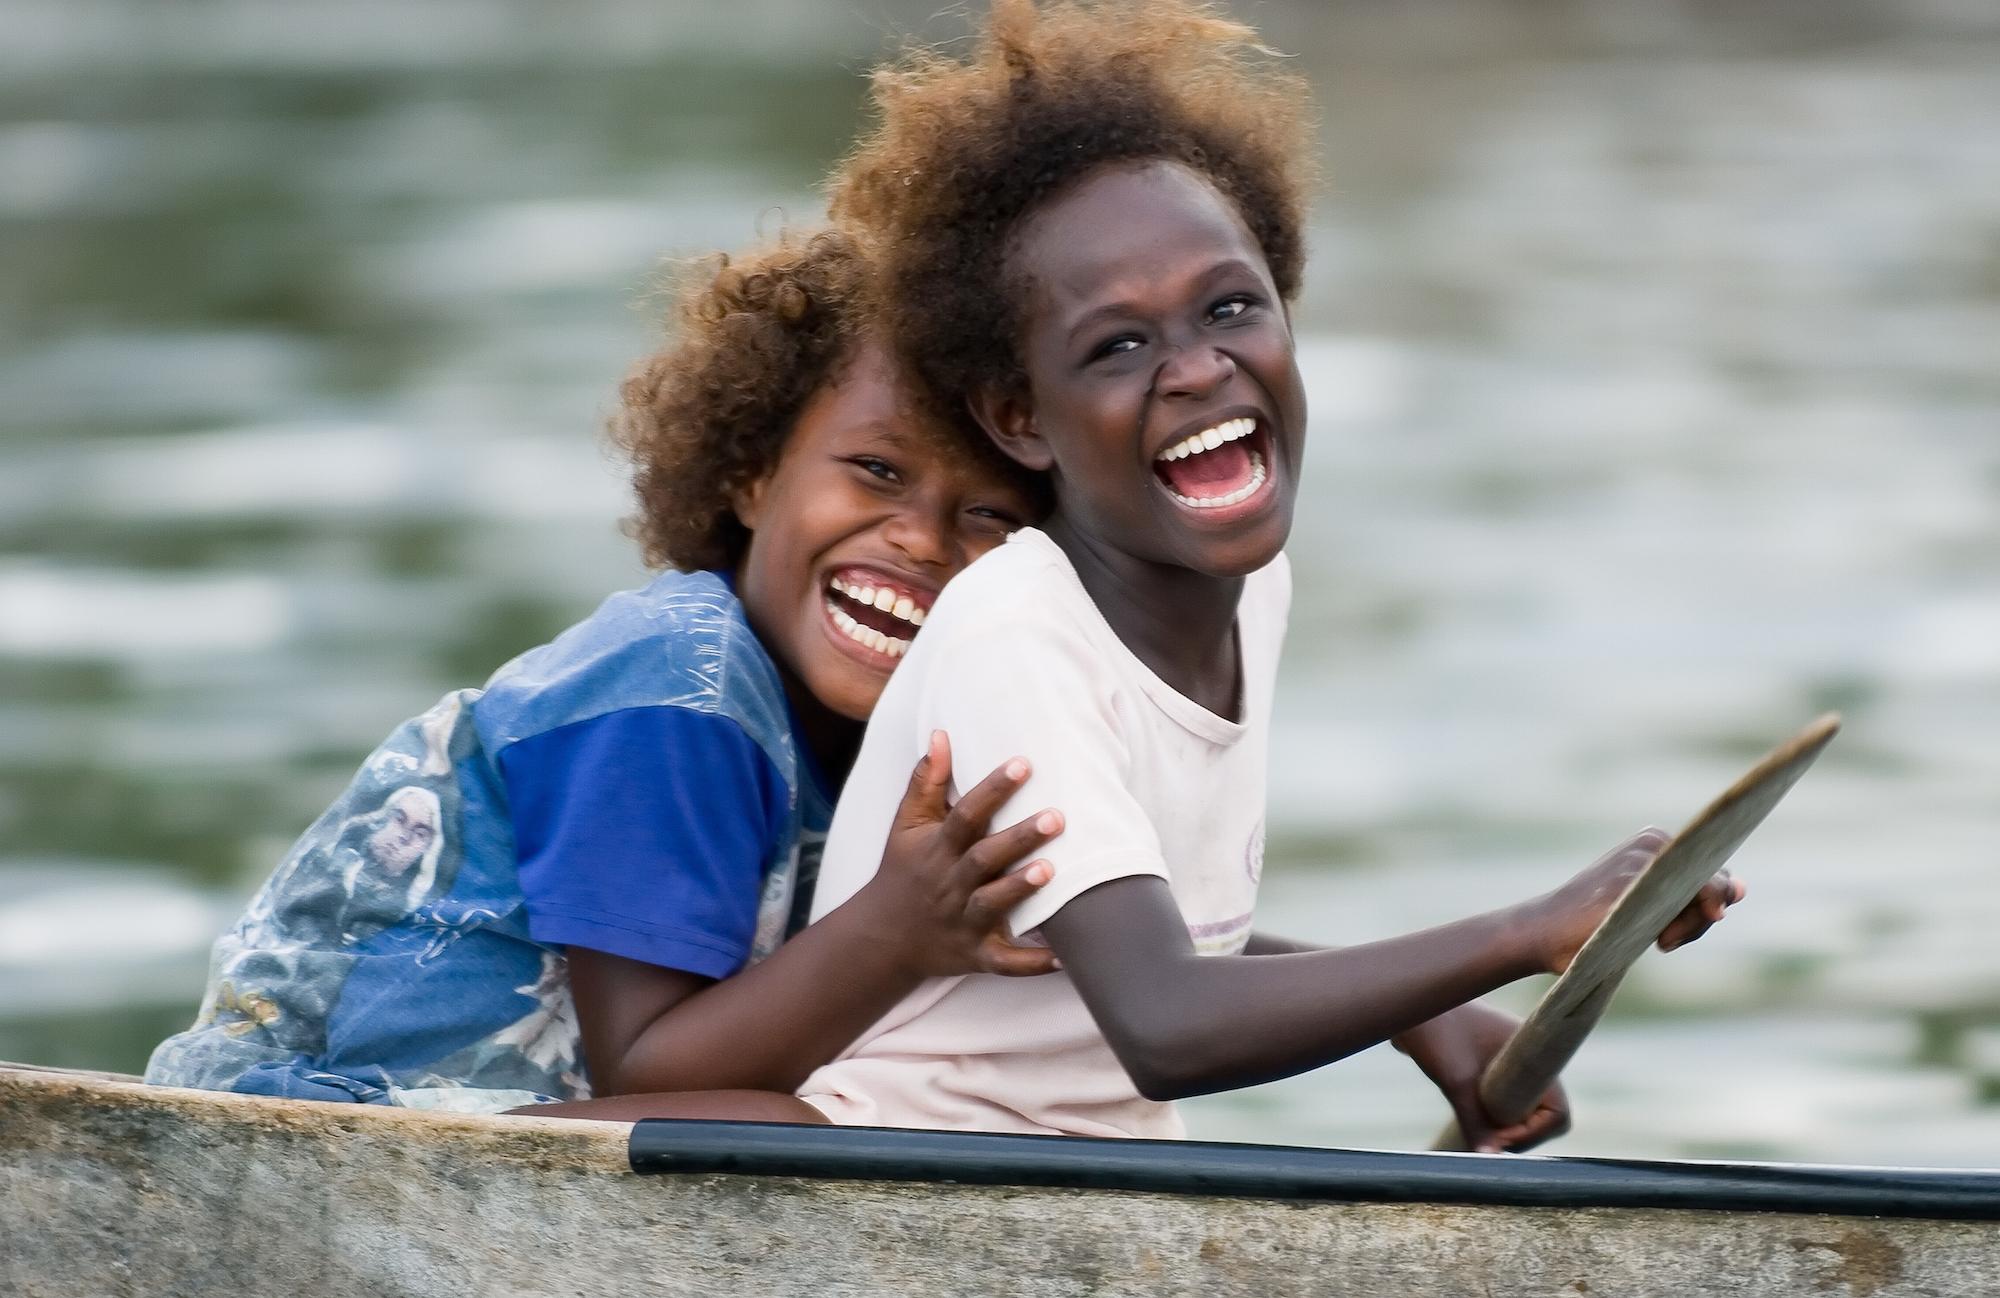 Arnavon_Islands_Solomons_068.jpg